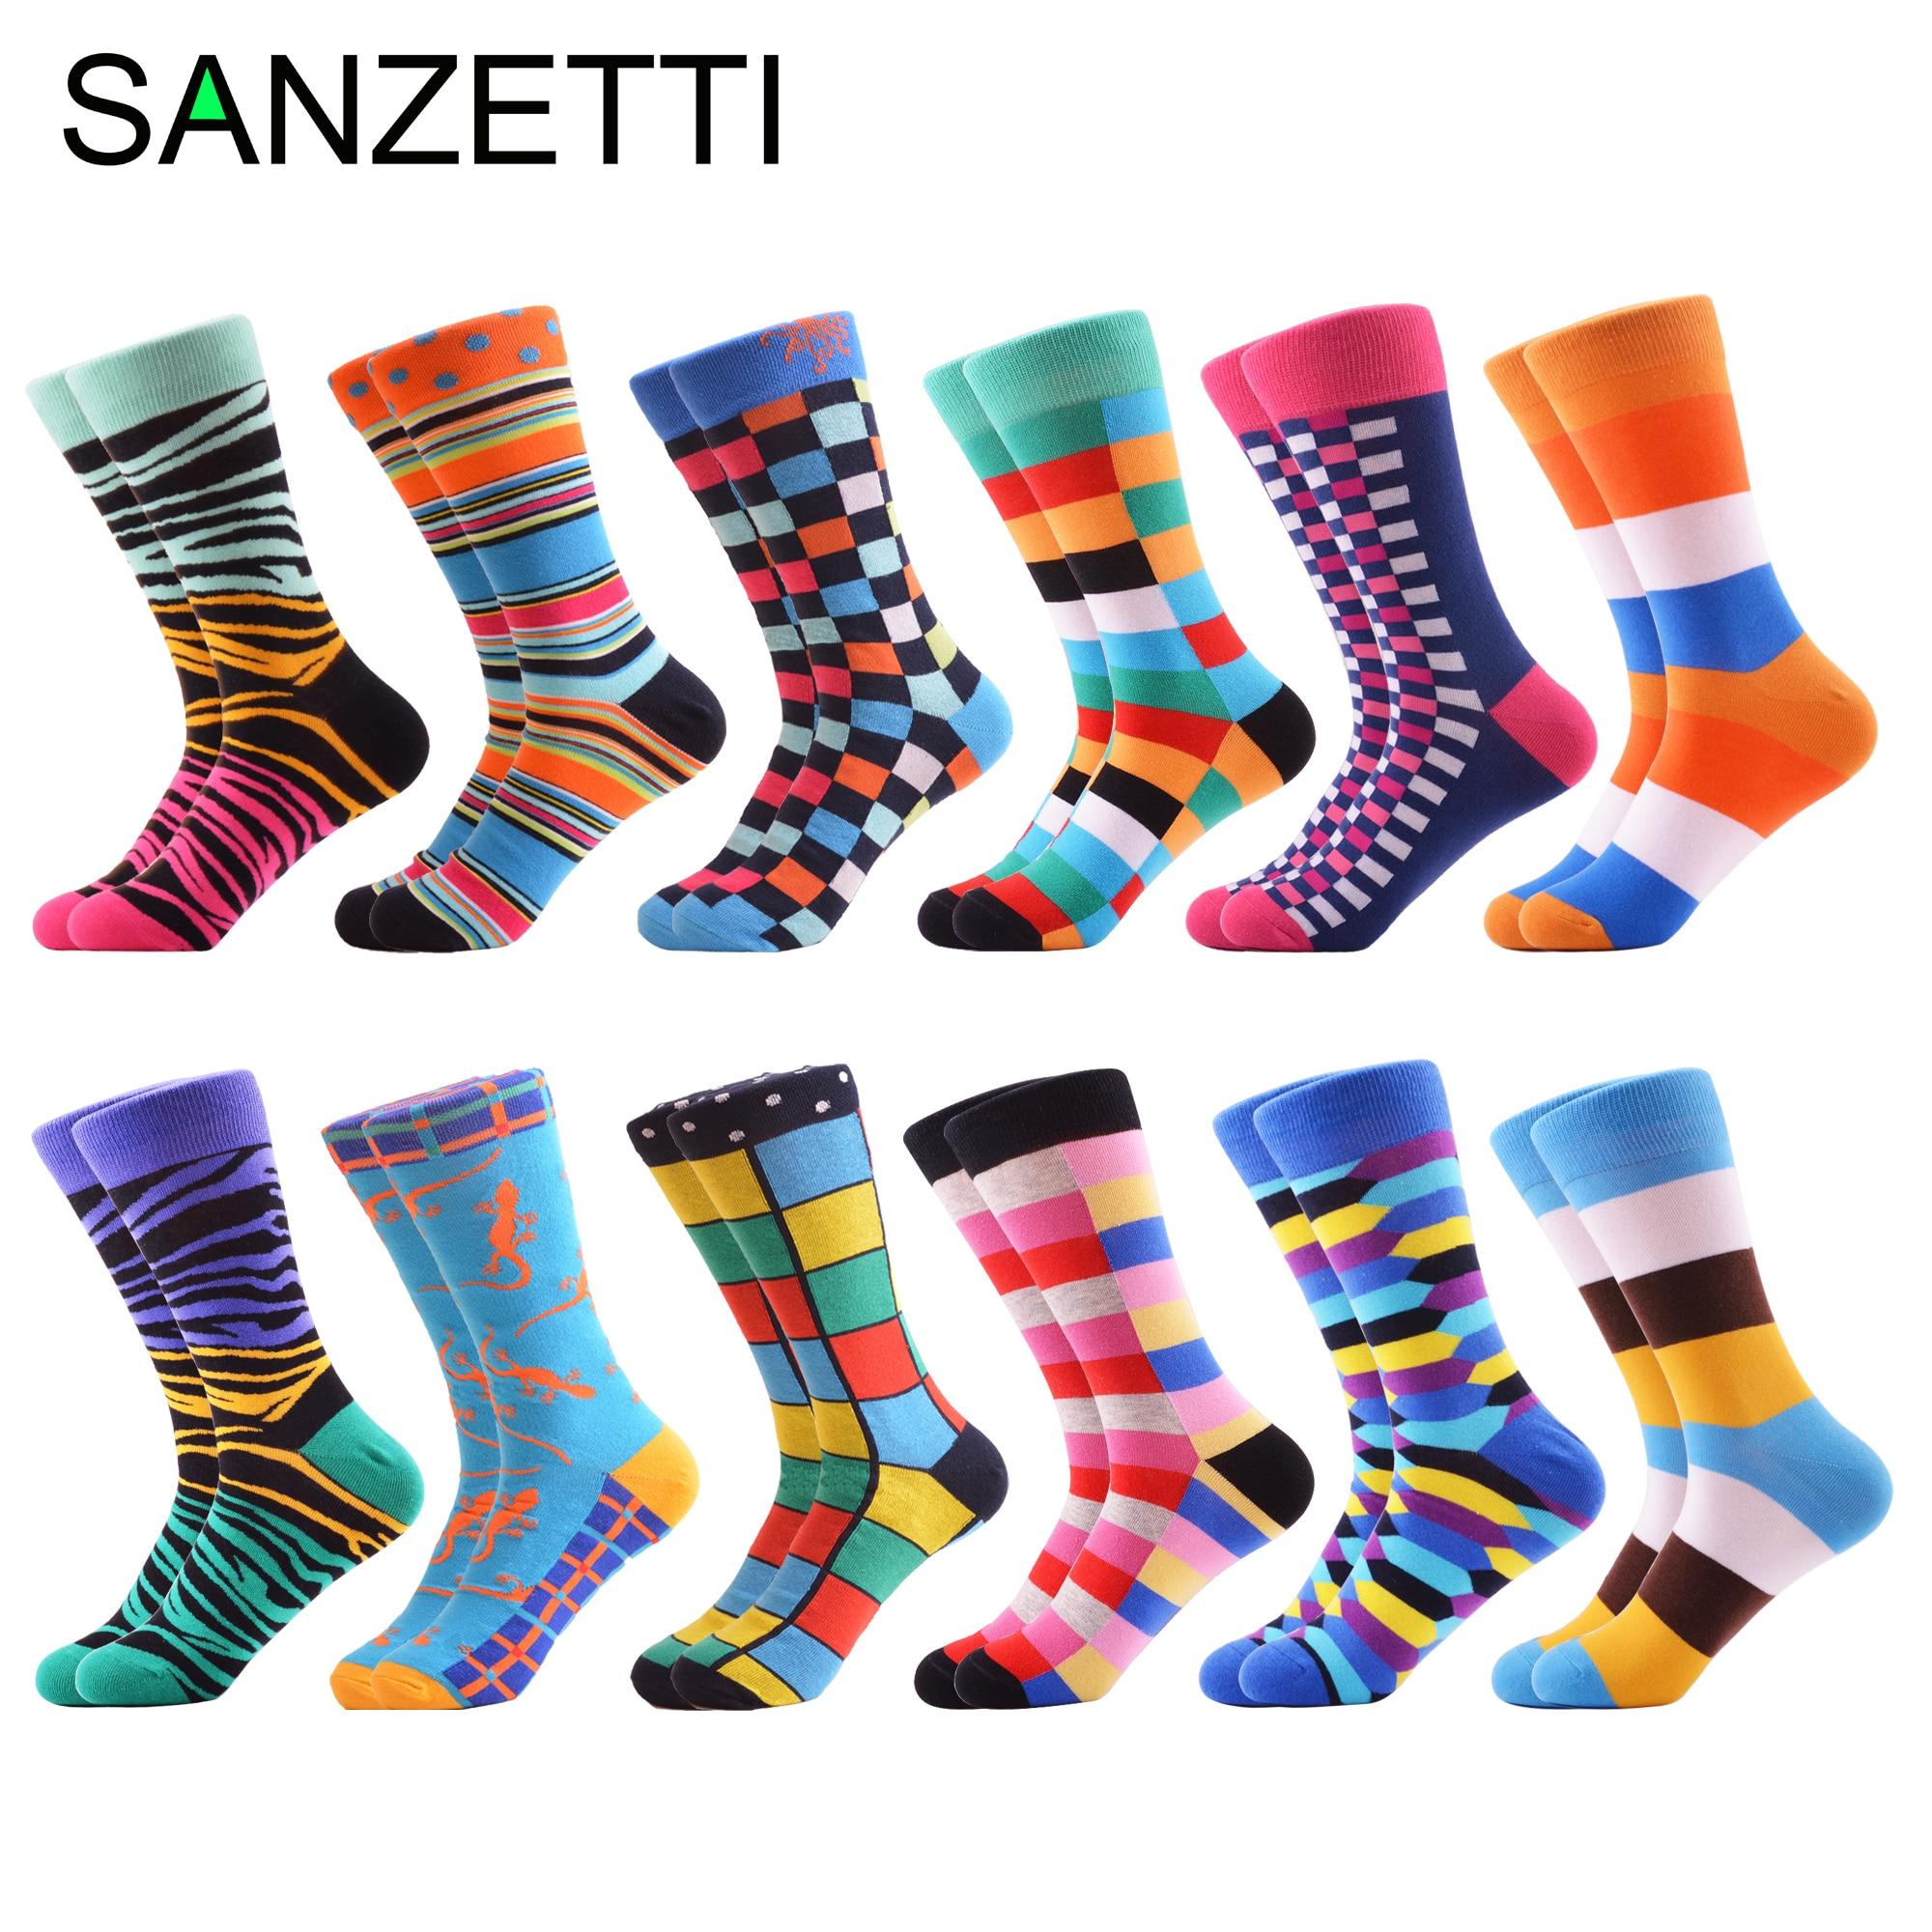 SANZETTI 12 Pairs/Lot Men Casual Combed Cotton Funny Crew Socks Harajuku Hipster Boat Socks Novelty Gifts Creative Dress Socks